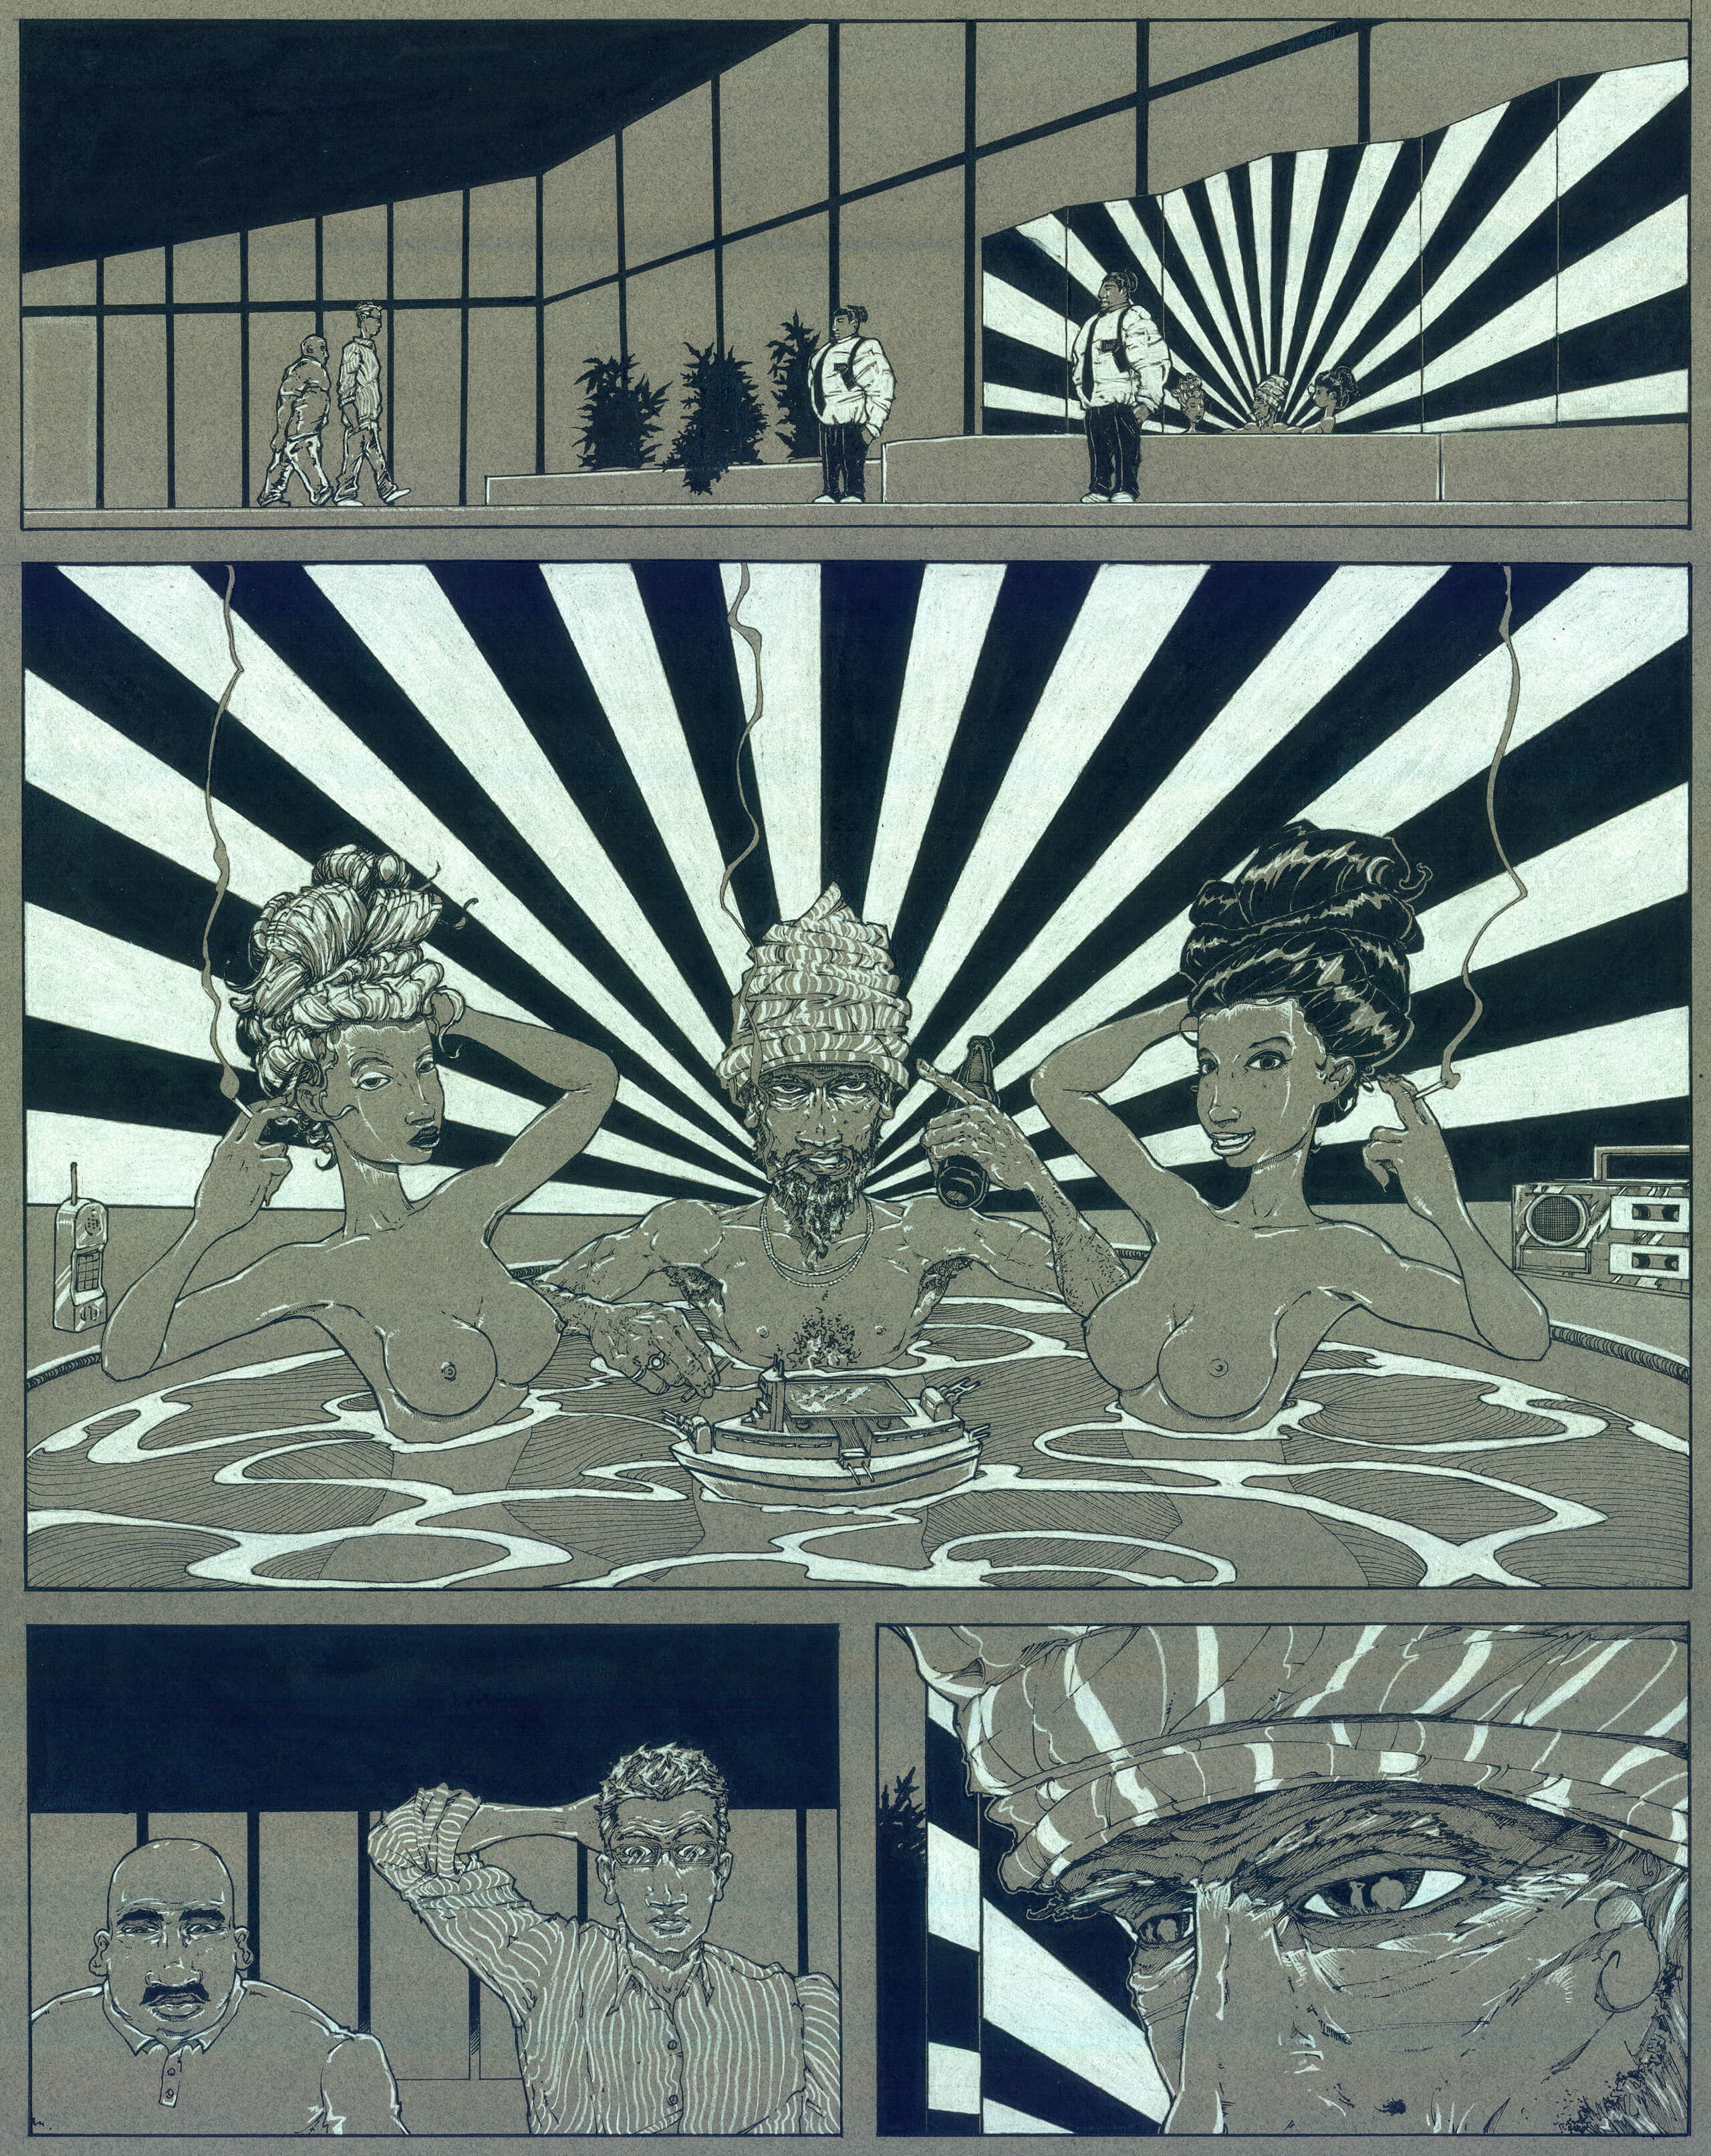 Parts of a failed Comic I made through film school